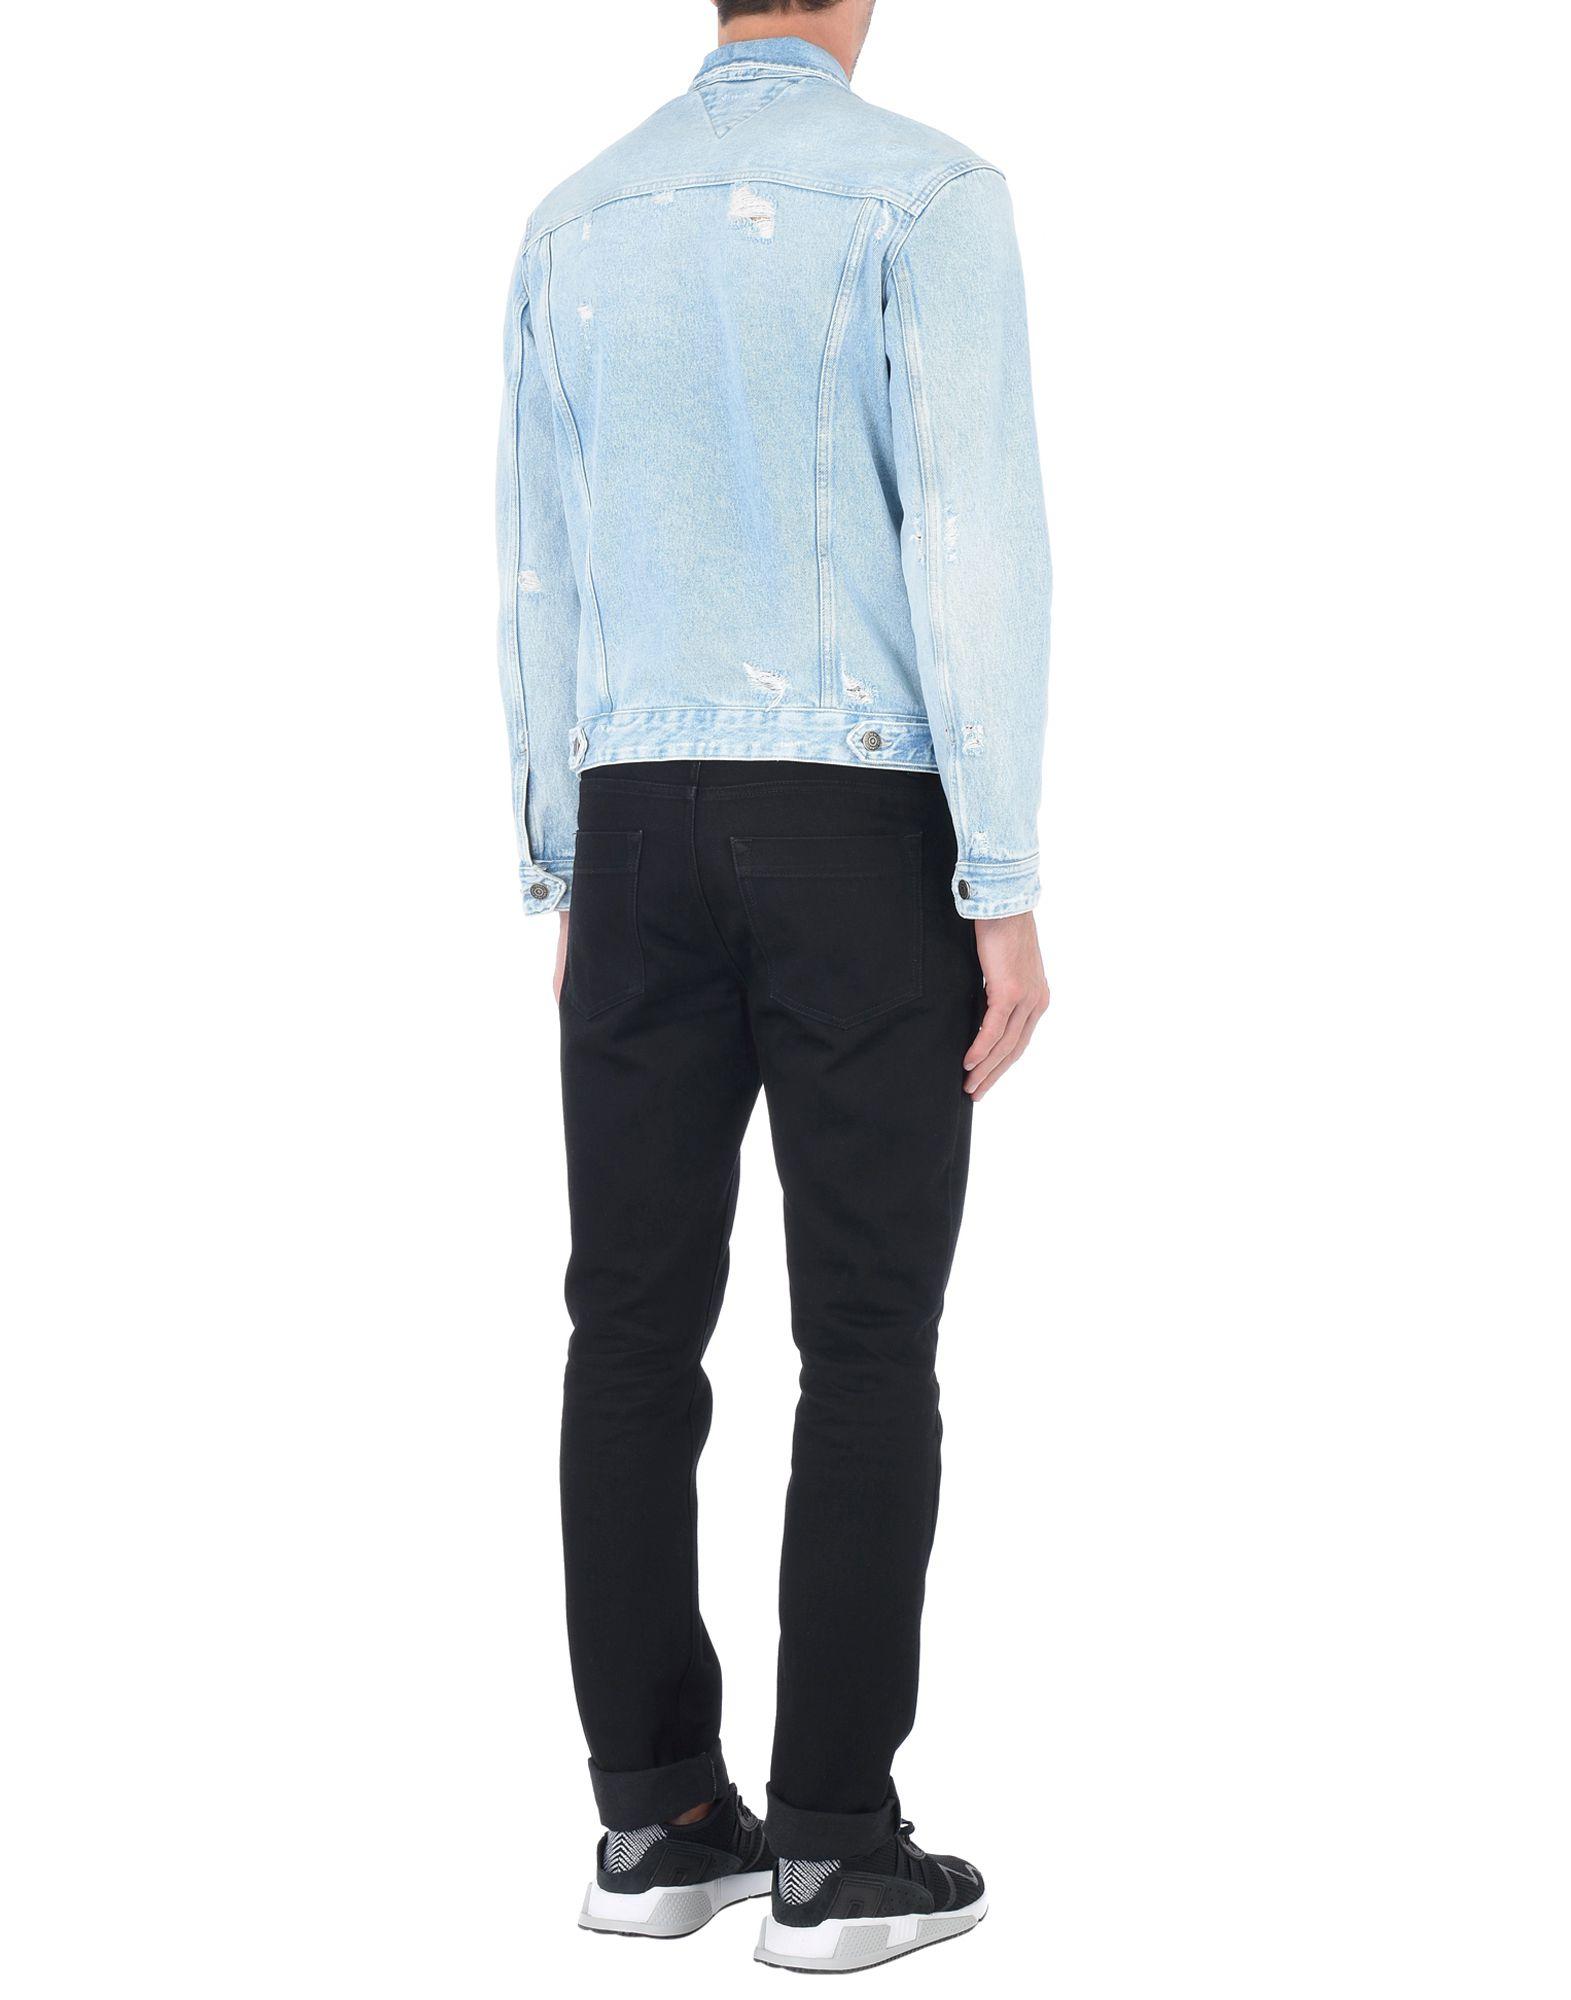 Giubbotto Uomo Jeans Tommy Jeans Tjm Classic Denim Tr - Uomo Giubbotto - 42684717BR 22ab5a